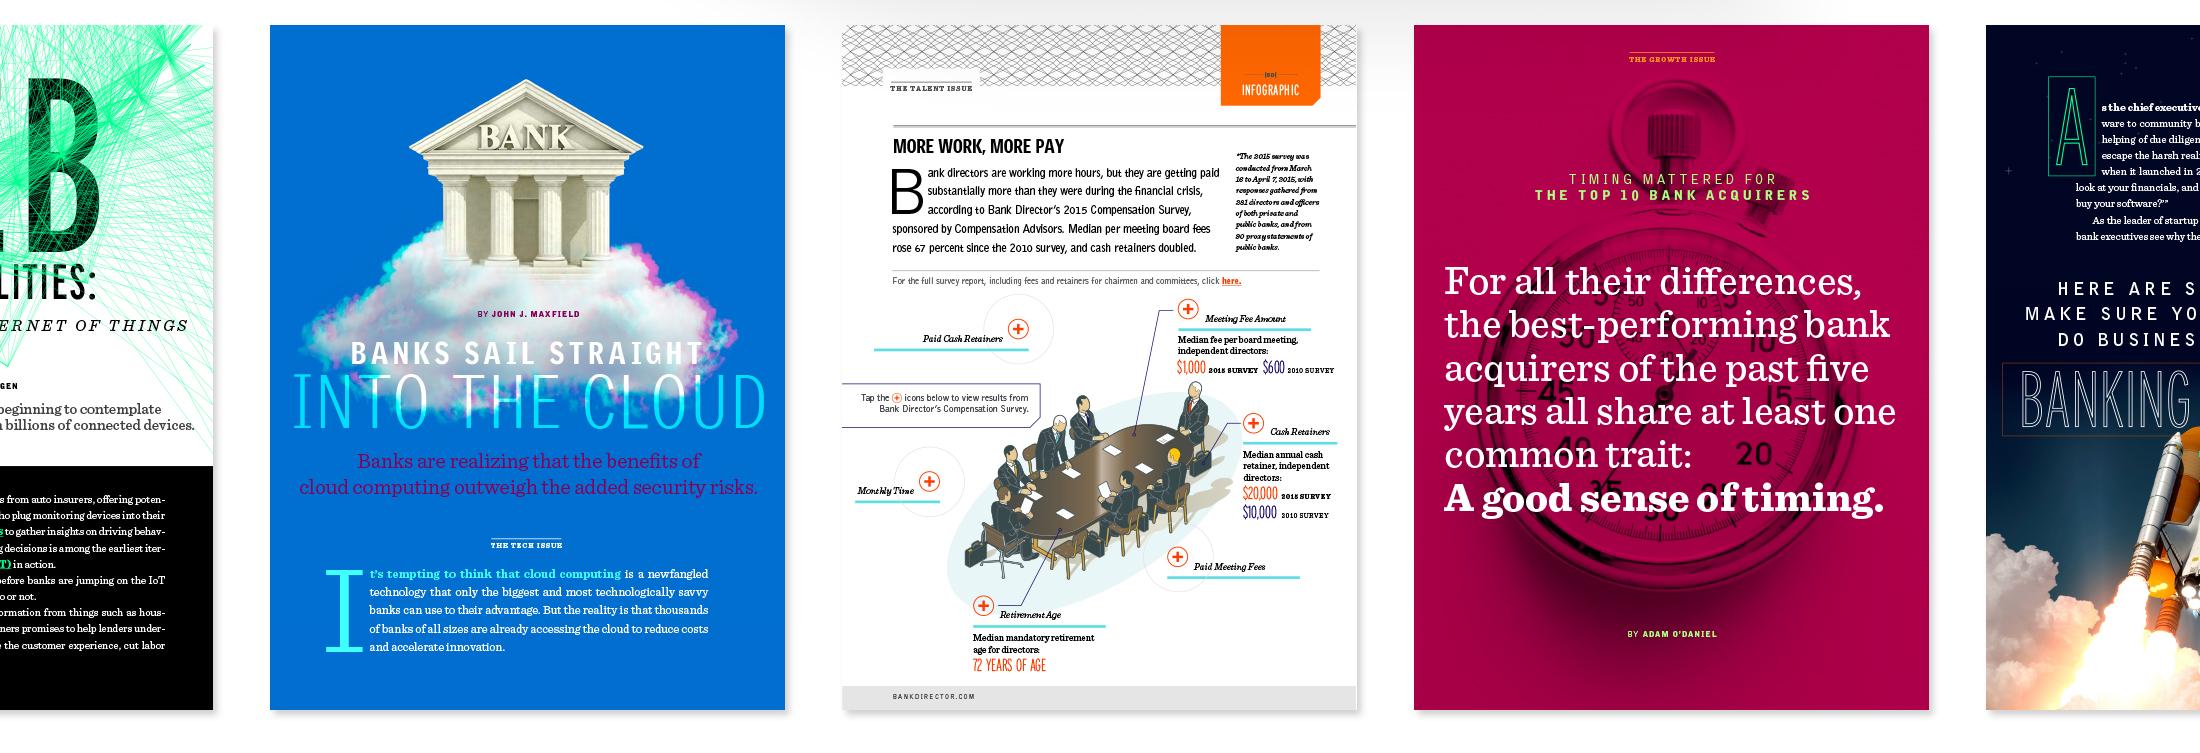 Bank Director Digital Magazine examples row 1 © Robertson Design